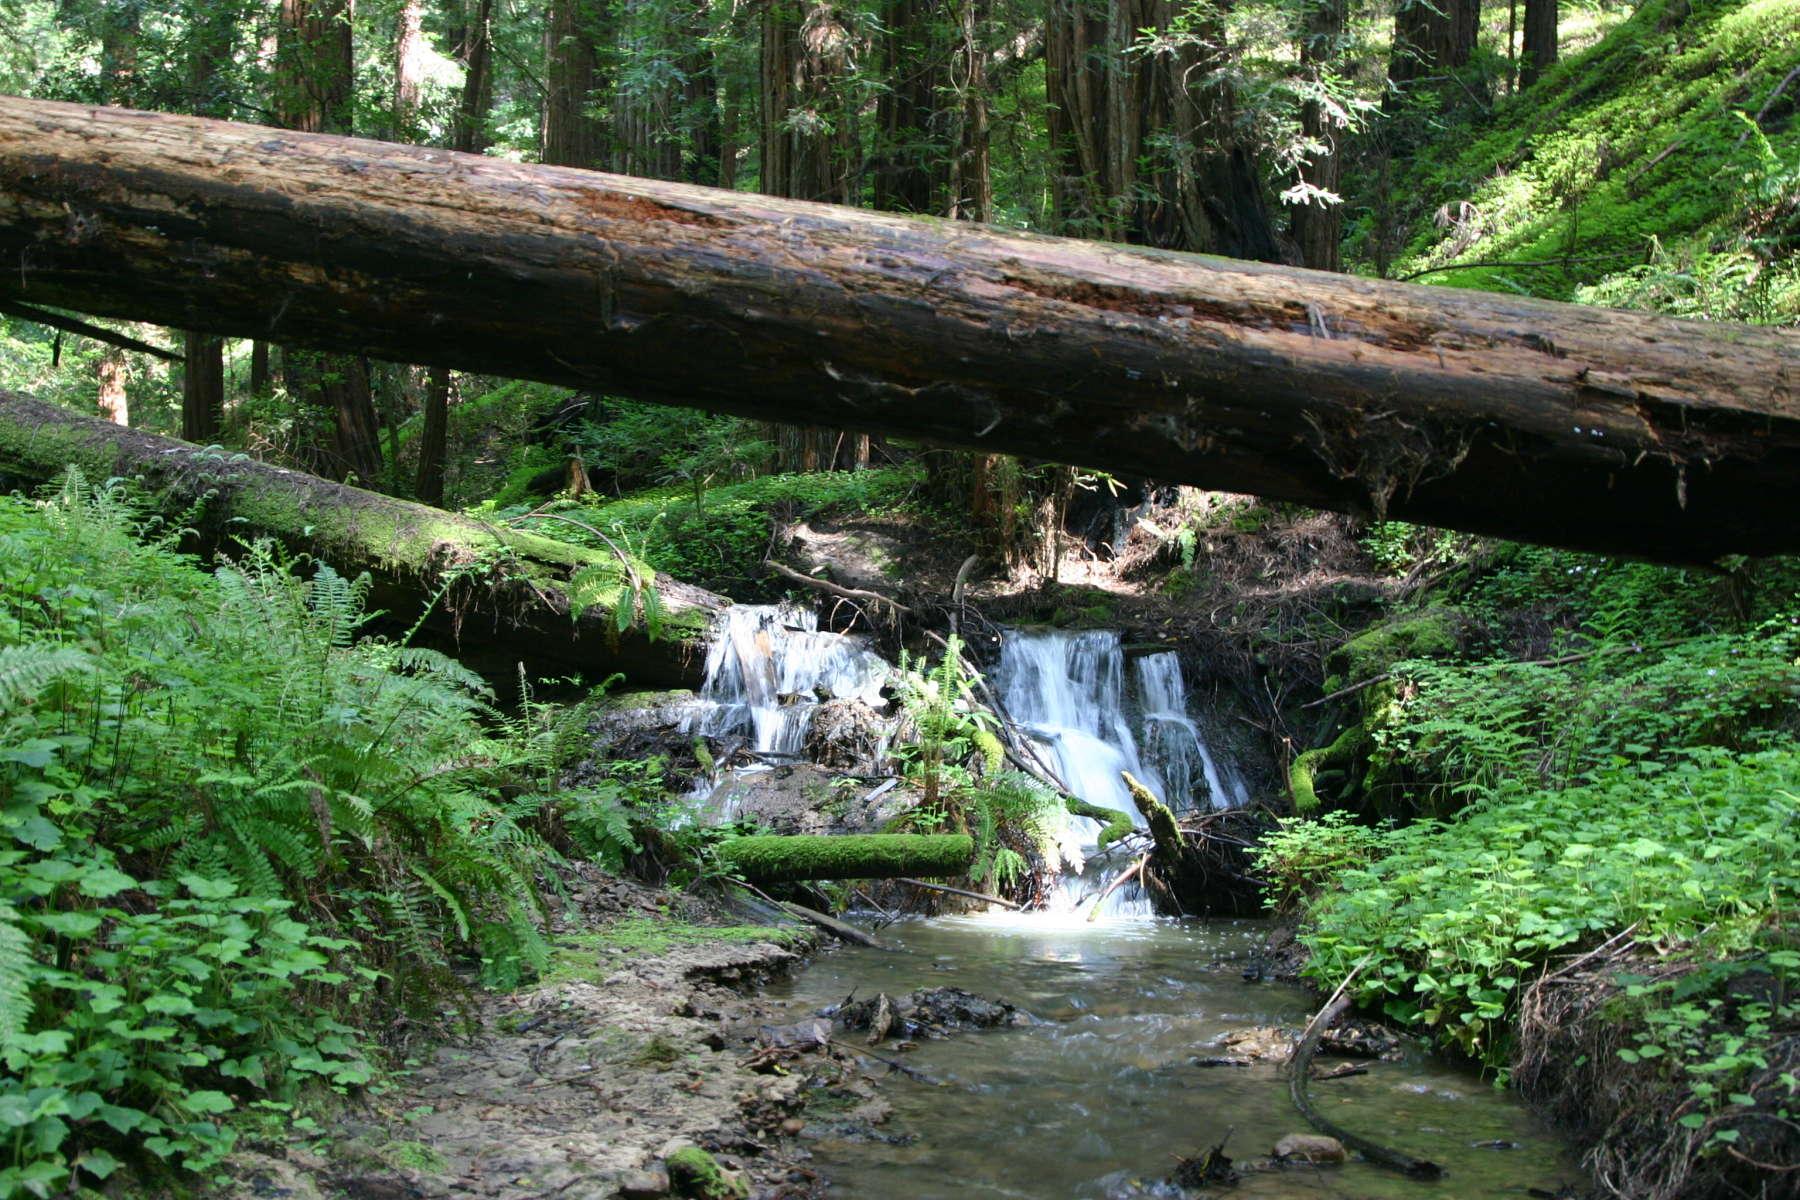 Portola Redwoods State Park Camping